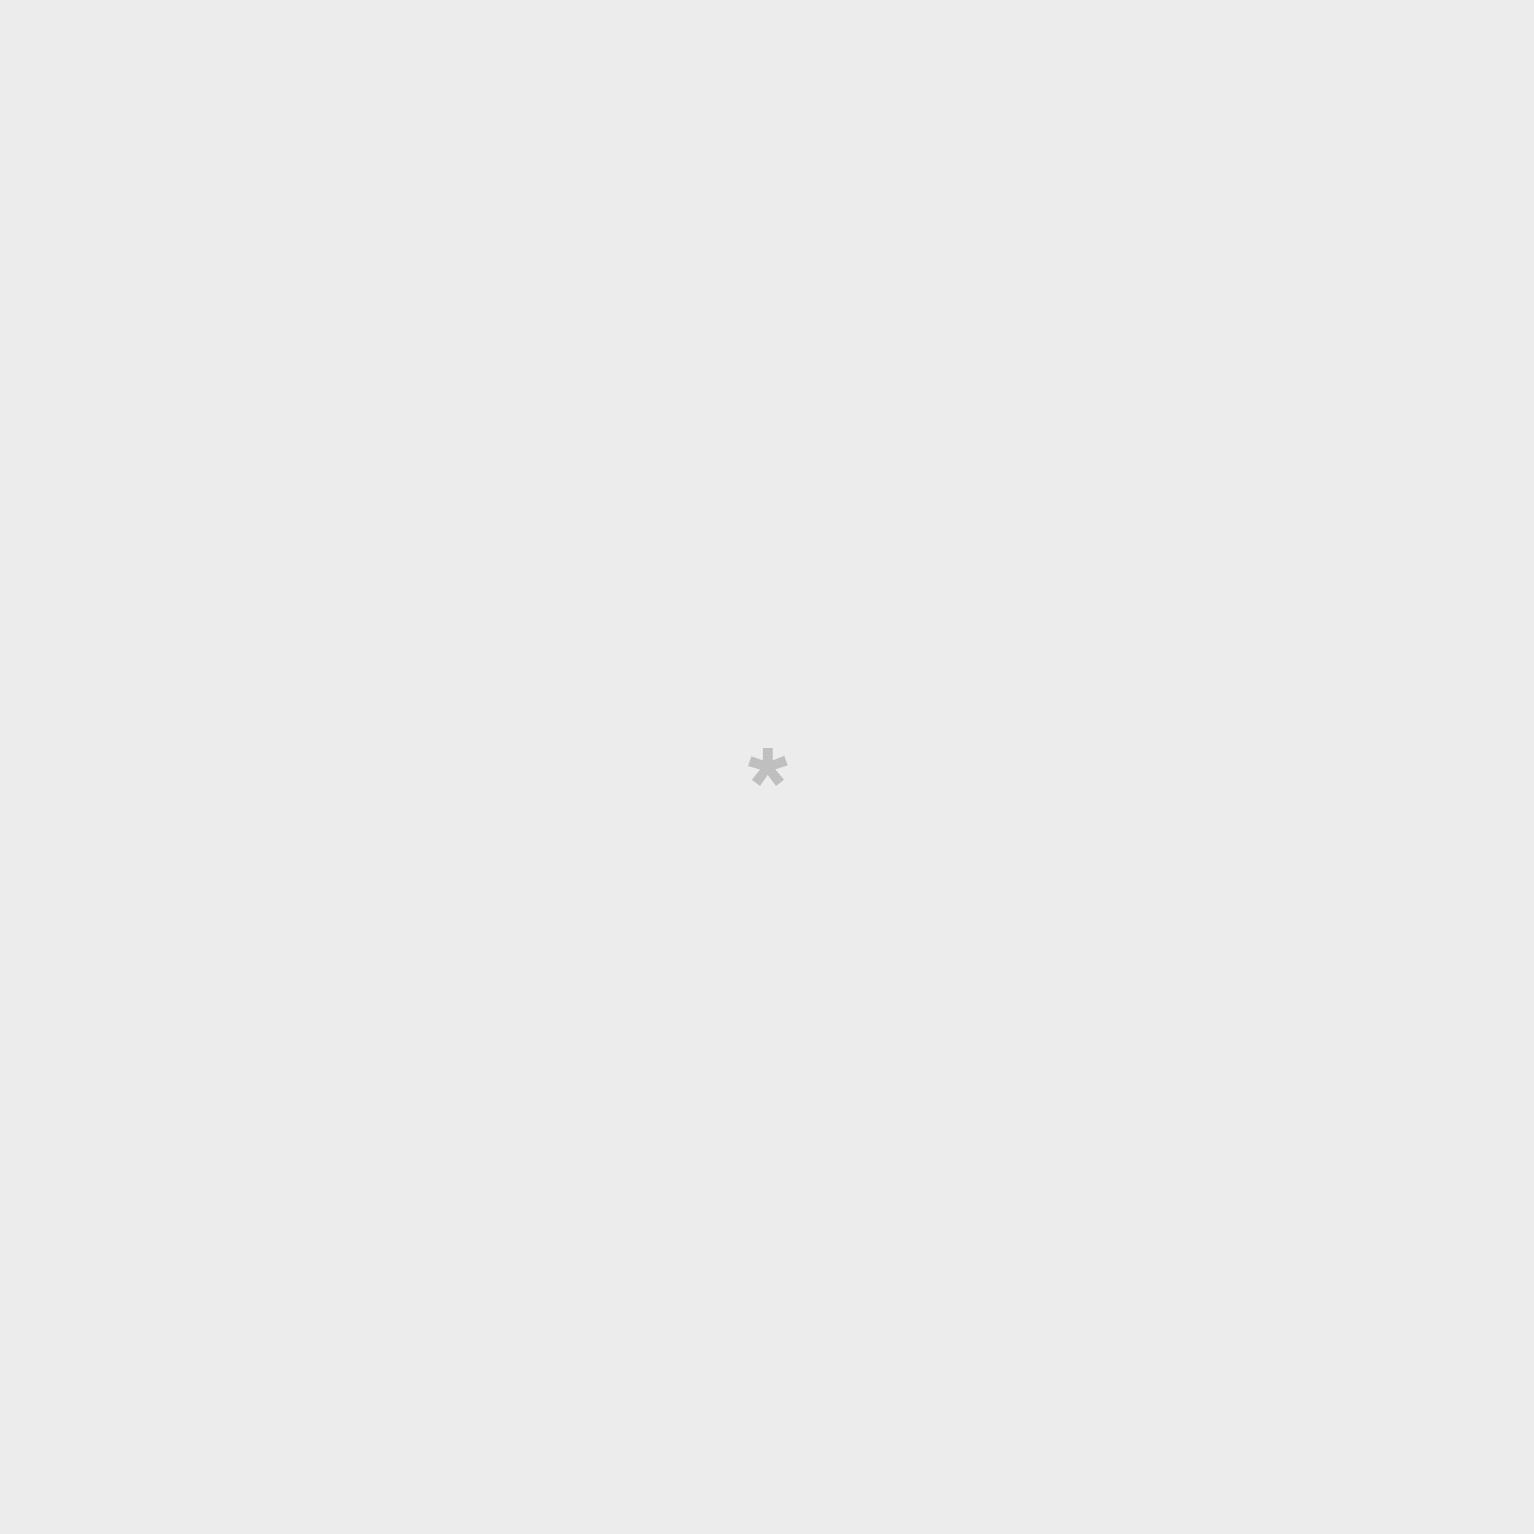 Caderno - Notas perfeitamente imperfeitas (PT)